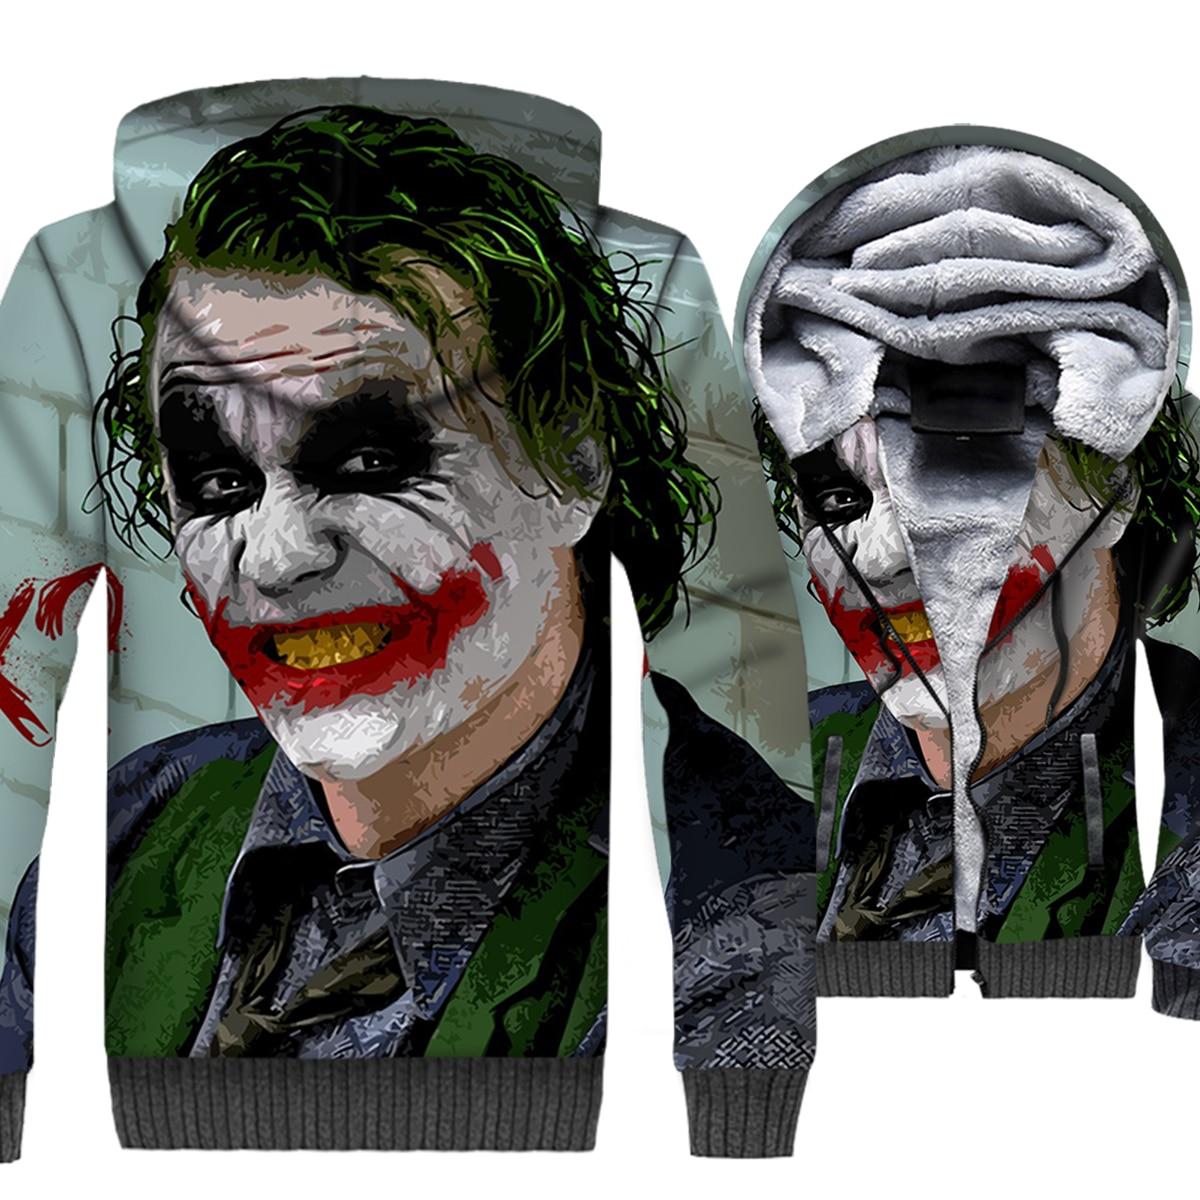 Batman Villains Joker 3D Hoodie Men Hip Hop Hooded Sweatshirt Who Laughs Coat Winter Thick Fleece Warm Jacket Swag Streetwear